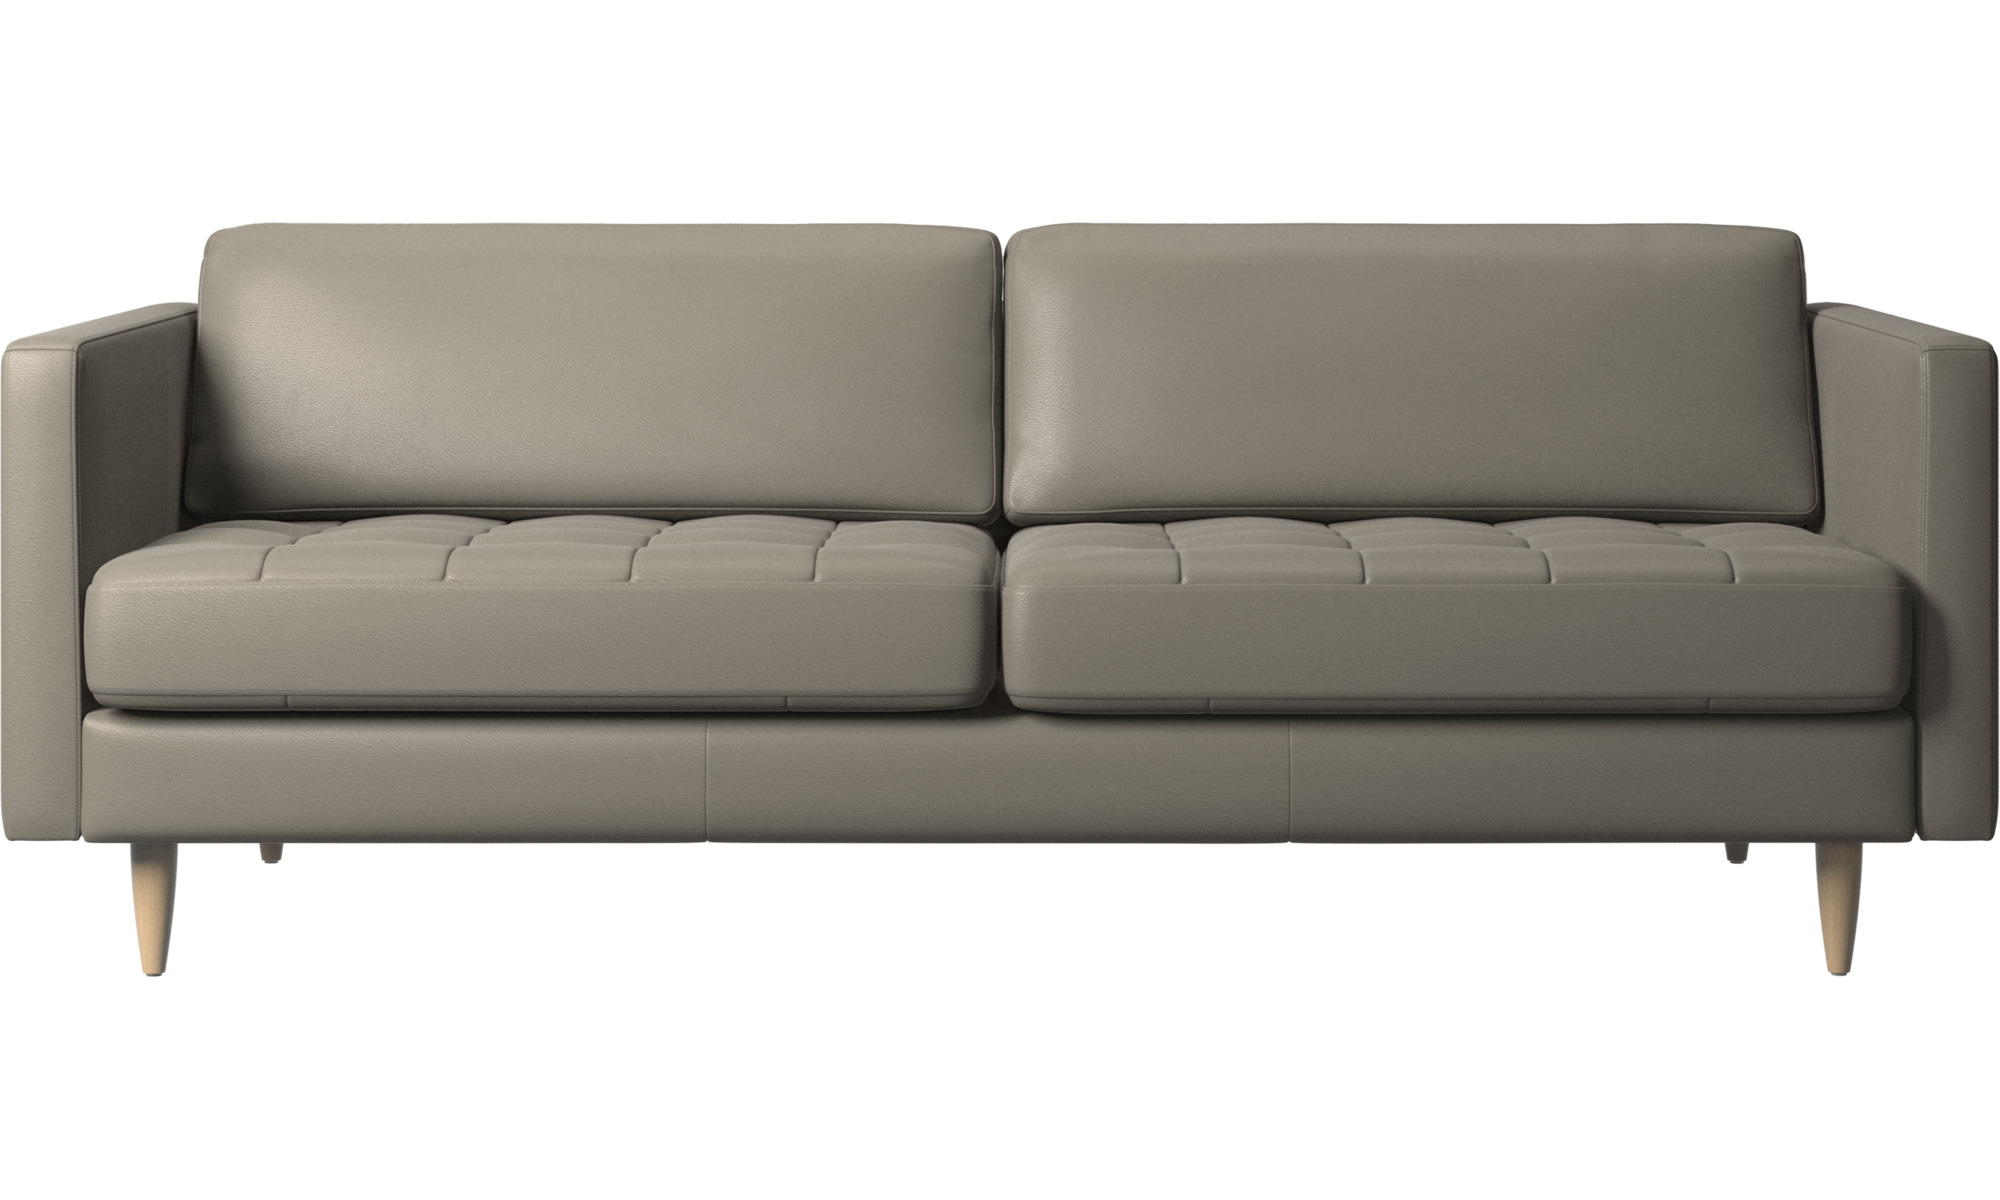 2½ personers sofaer - Osaka sofa, tuftet sædehynde - Grå - Læder